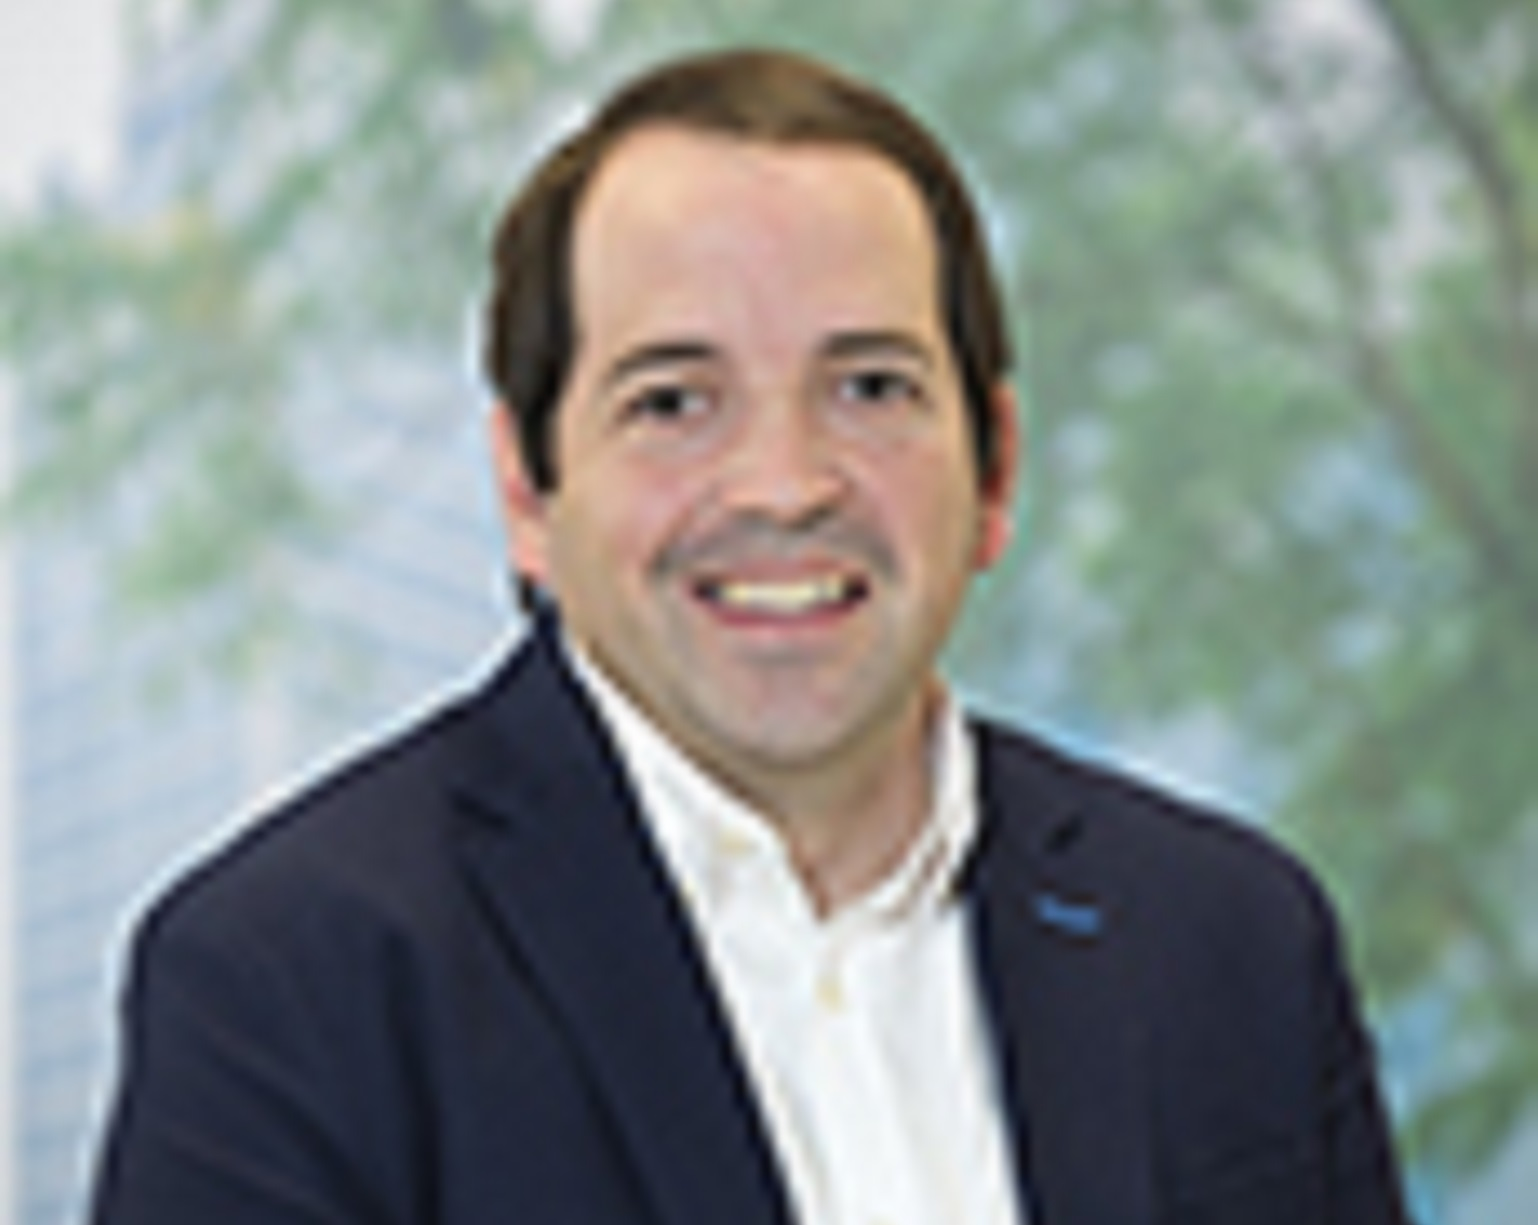 Lic. Rodrigo Fernández